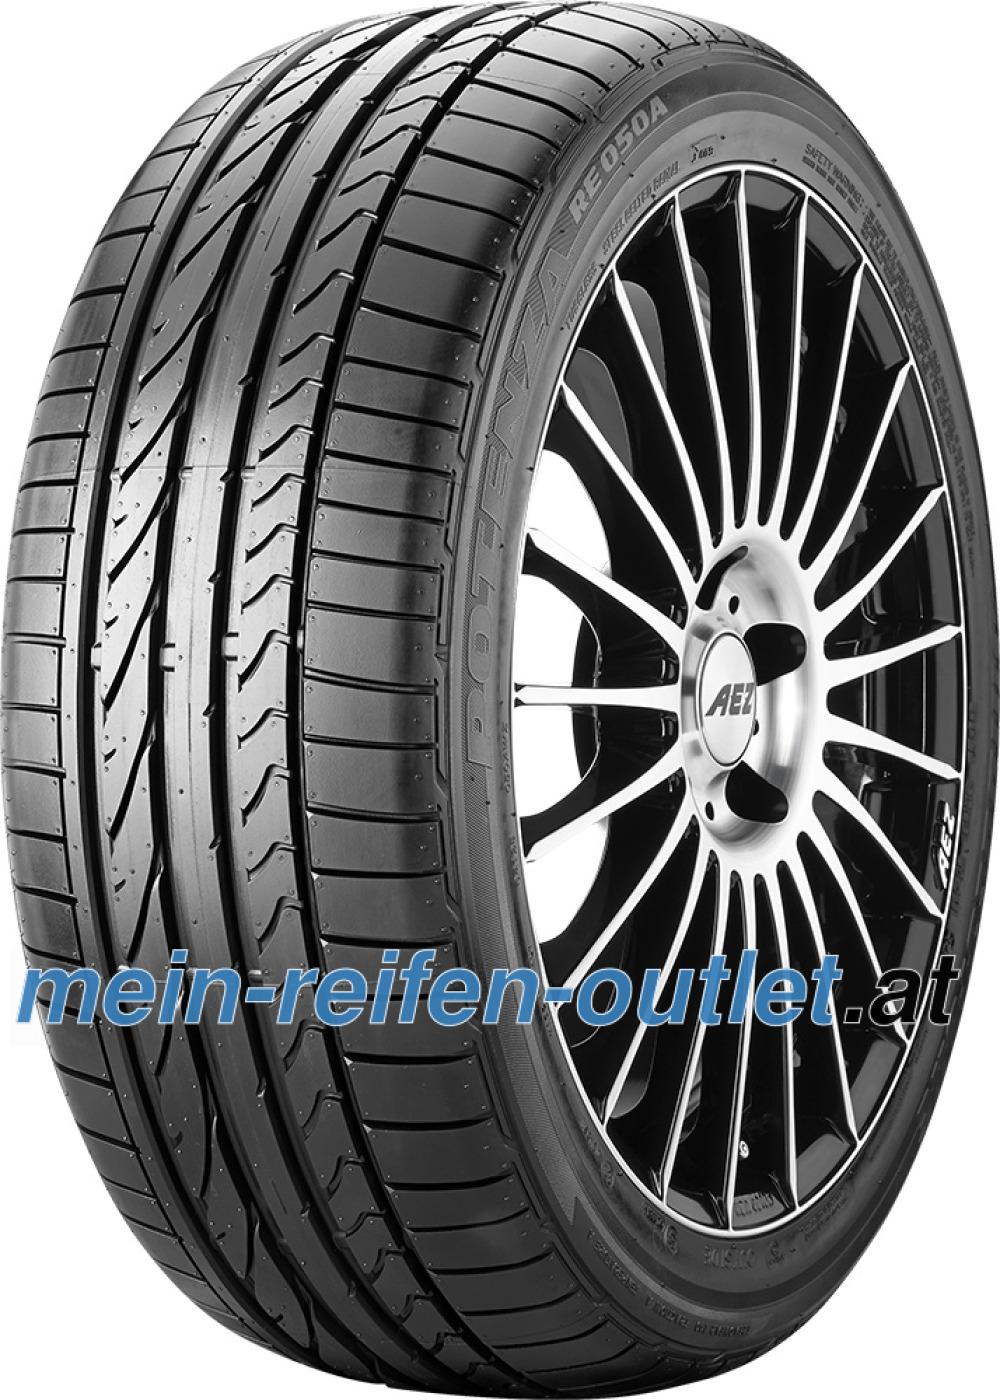 Bridgestone Potenza RE 050 A ( 285/35 R18 97W MO, mit Felgenschutz (MFS) )